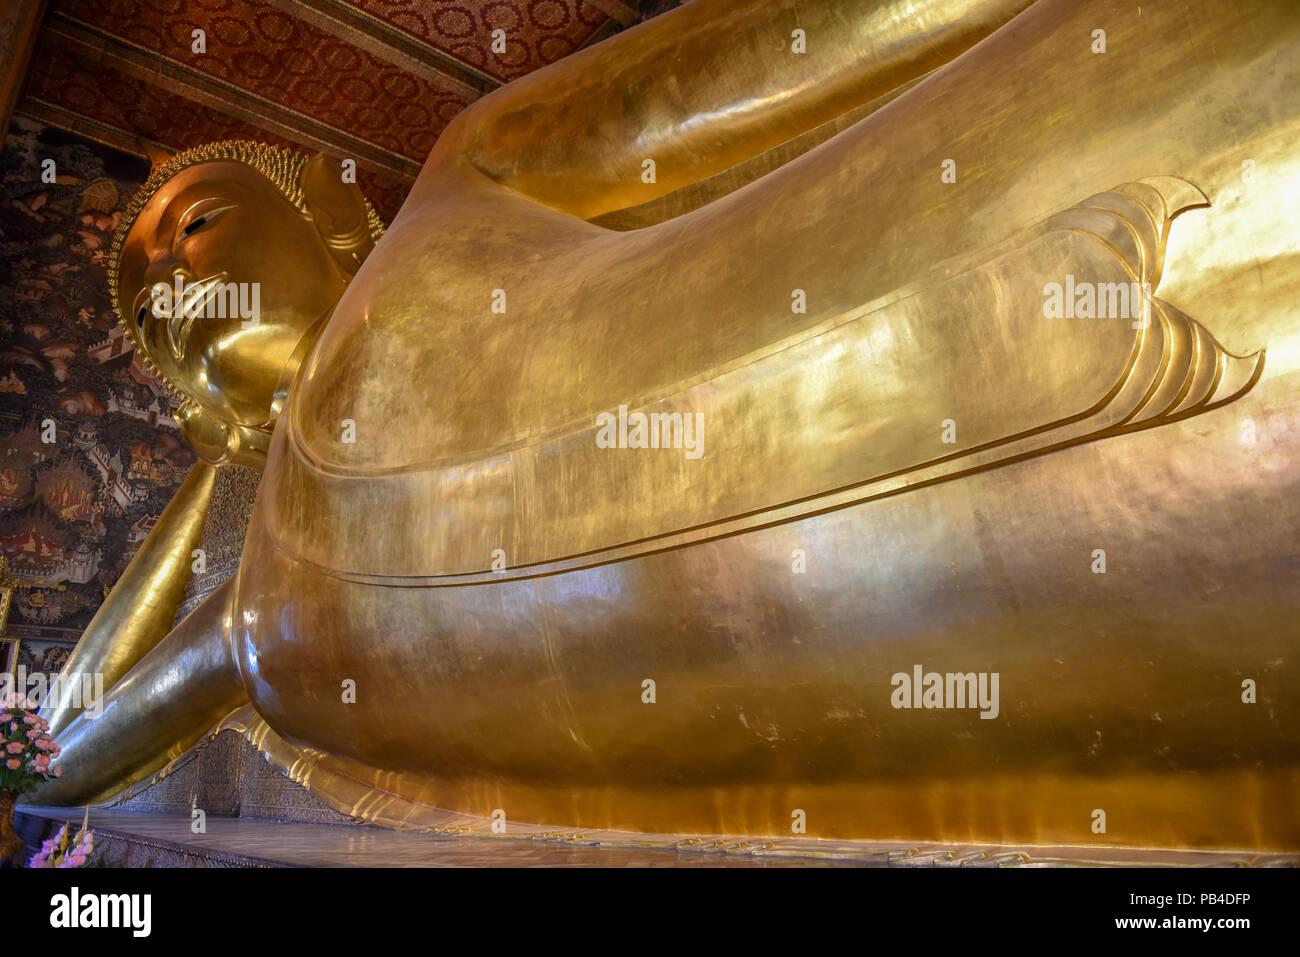 Big golden reclining Buddha of Wat Pho temple in Bangkok, Thailand. - Stock Image